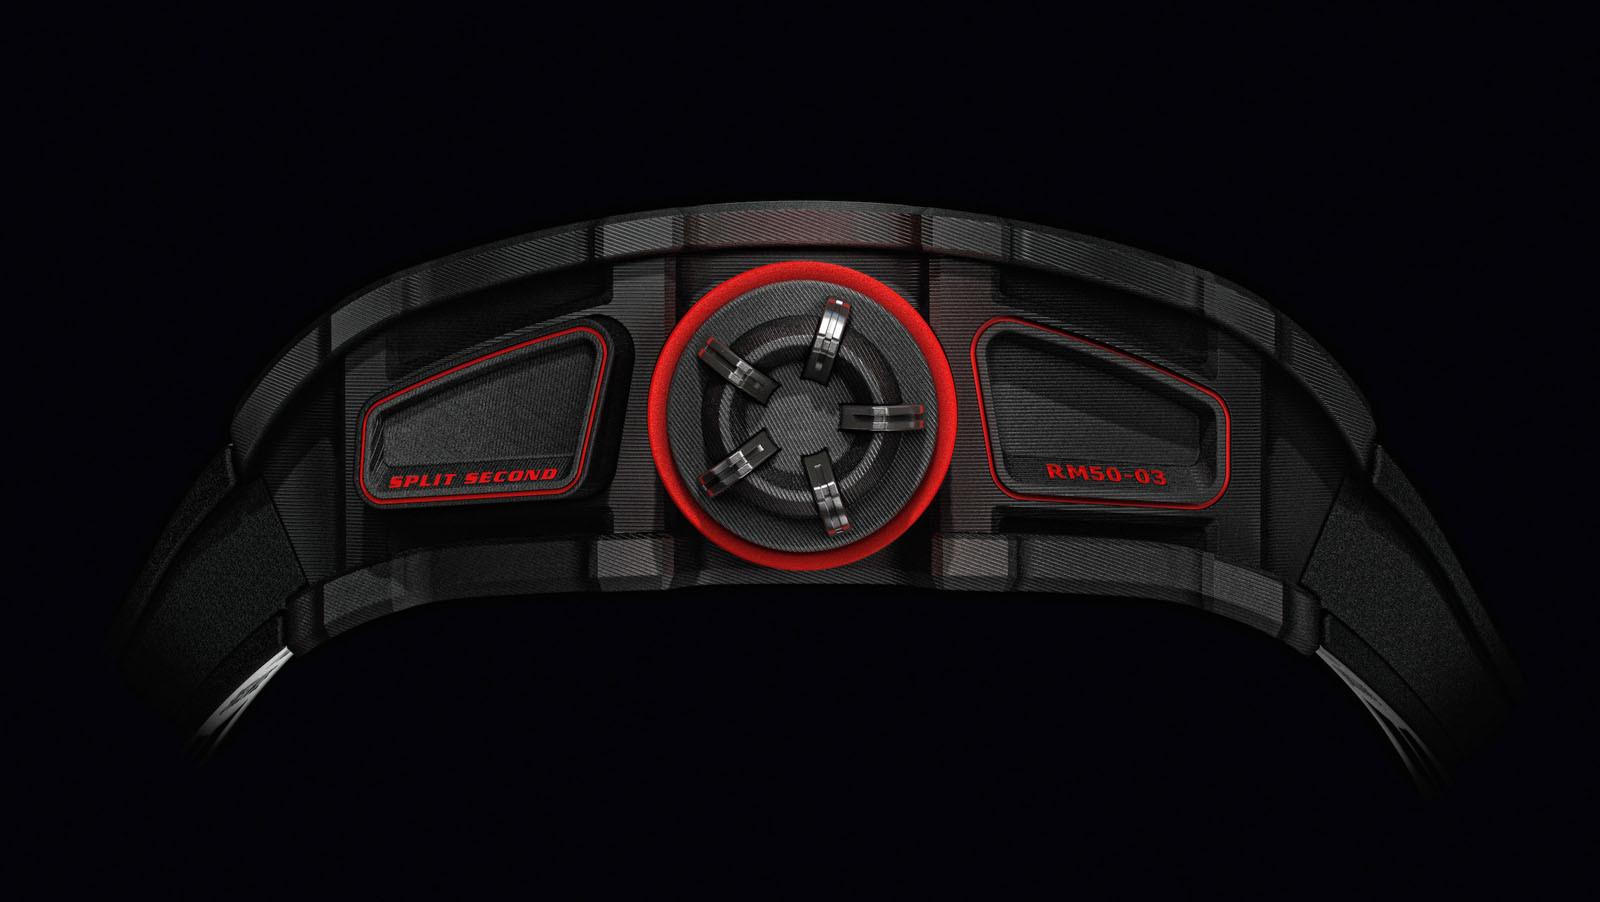 Foto de RM 50-03 Tourbillon Split Seconds Chronograph Ultralight McLaren F1 (3/5)